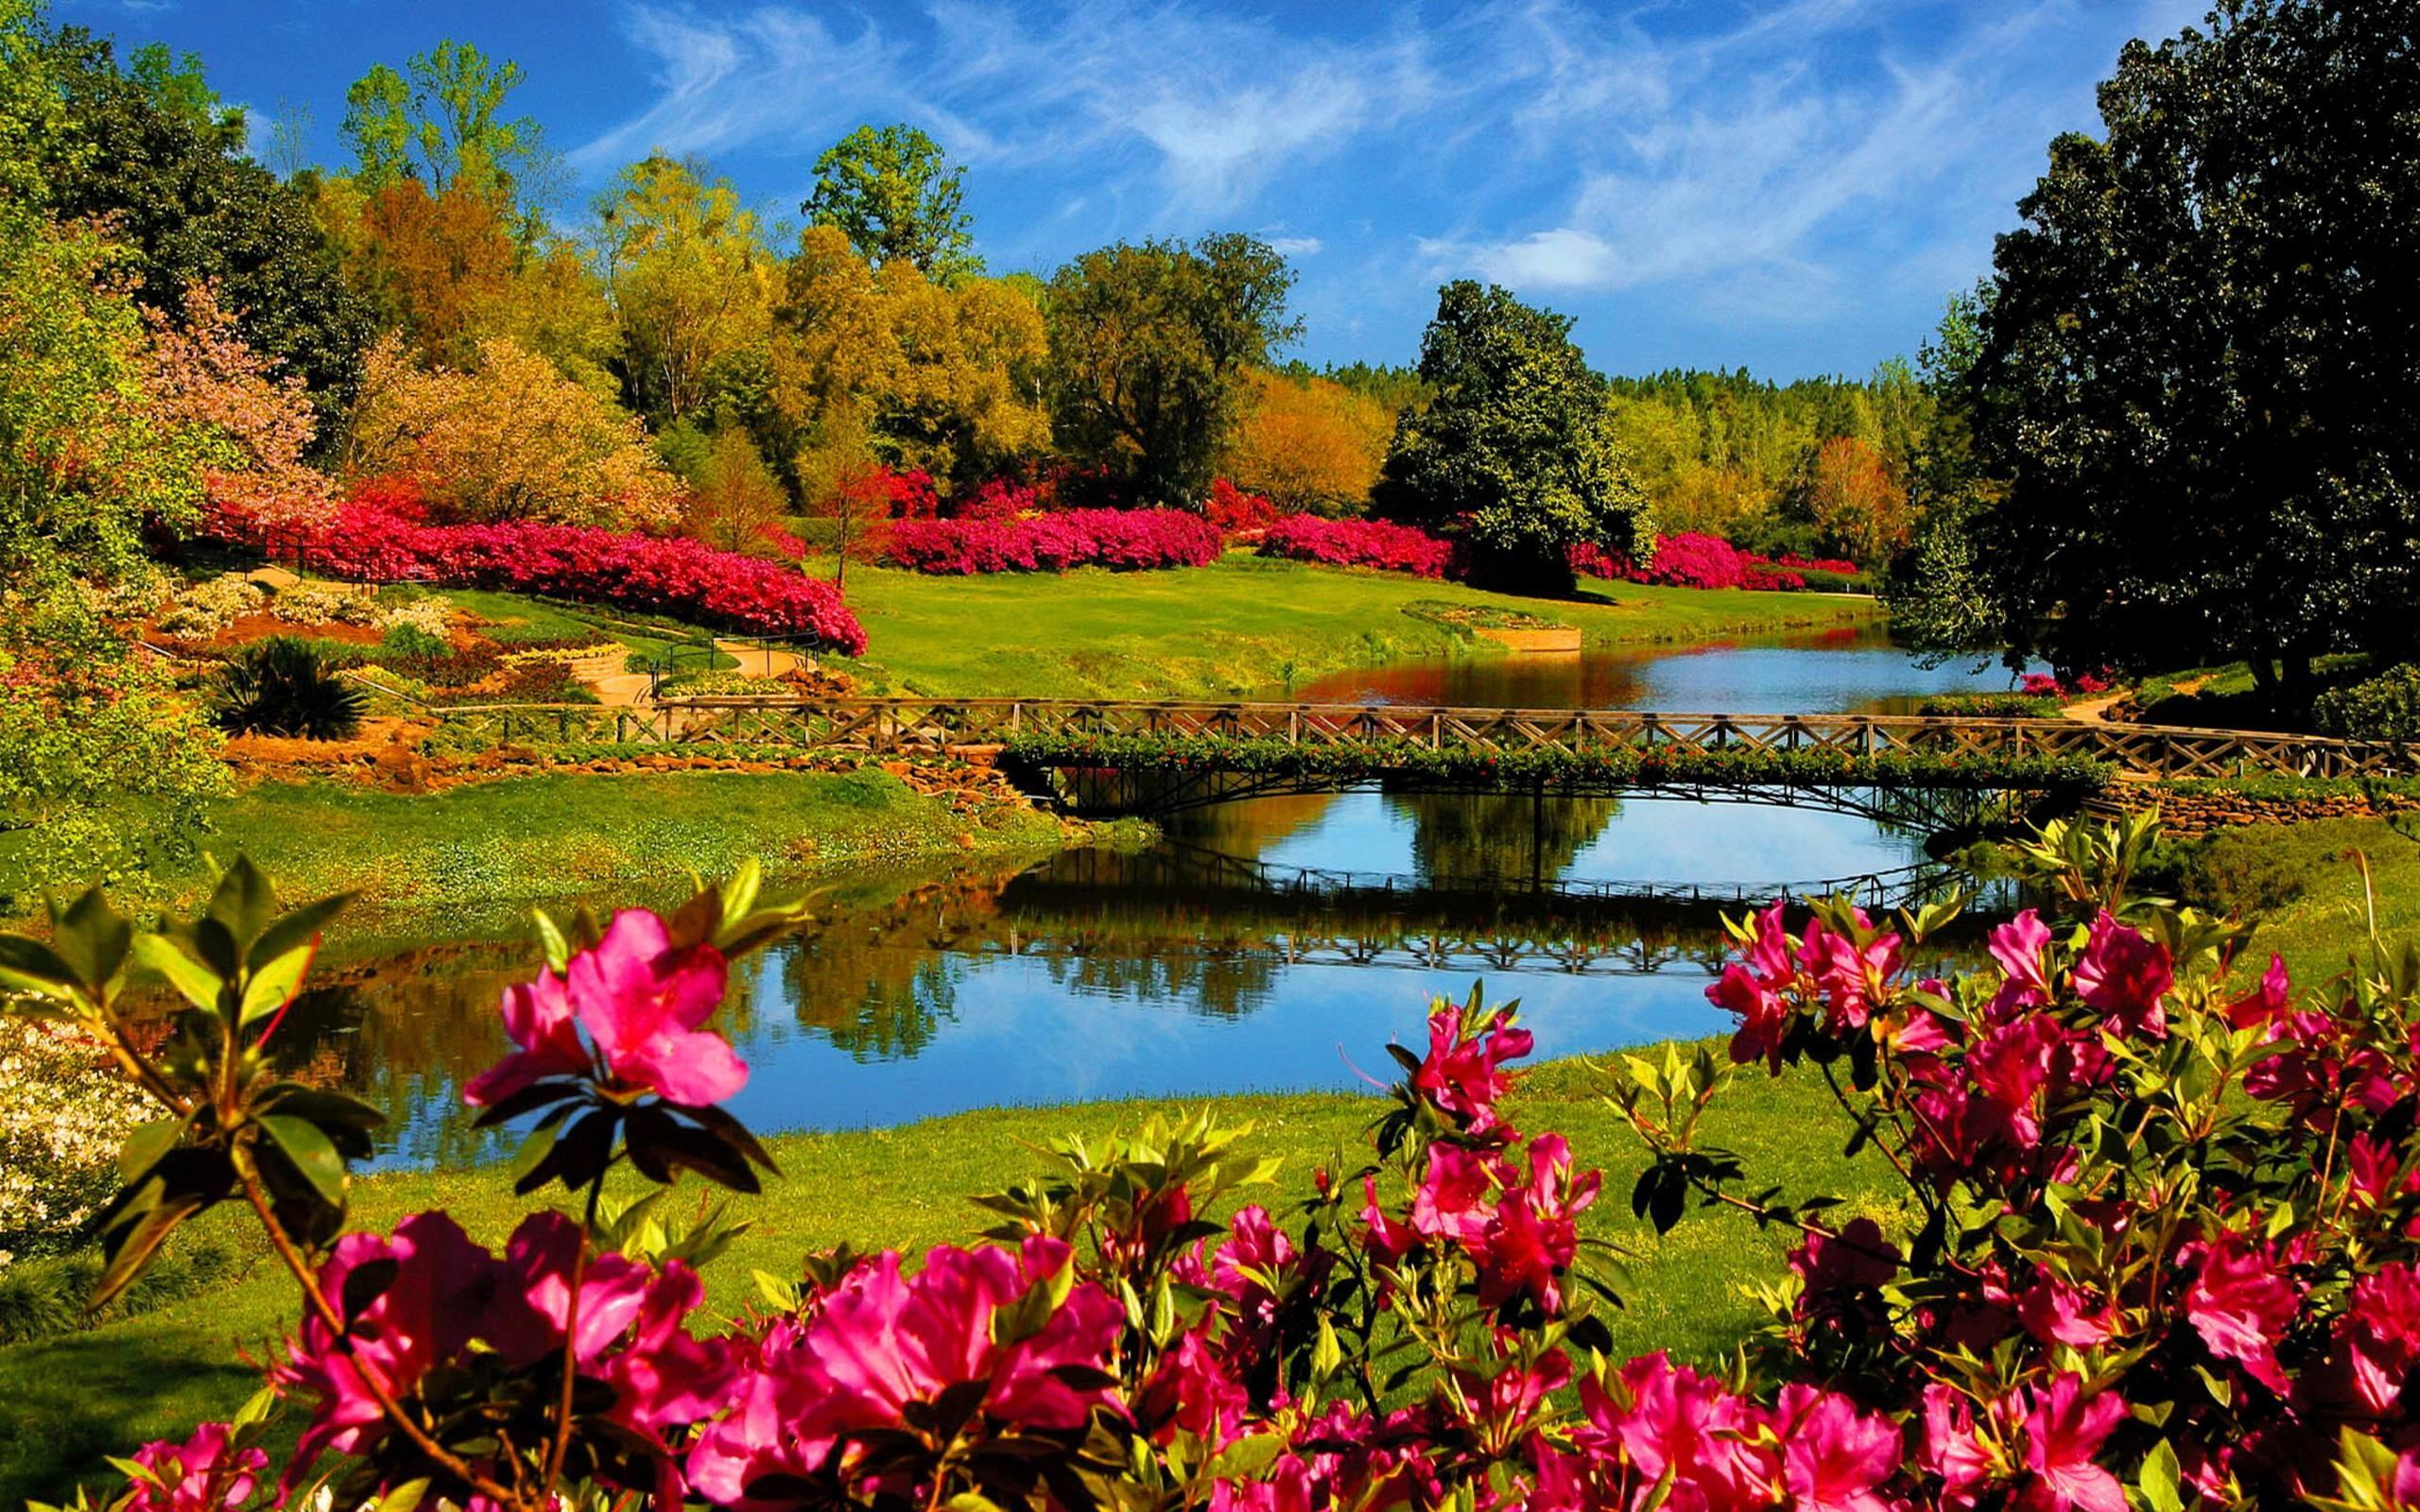 nature screensavers and wallpaper | Nature Wallpaper 3 | Places to Visit |  Pinterest | Nature wallpaper